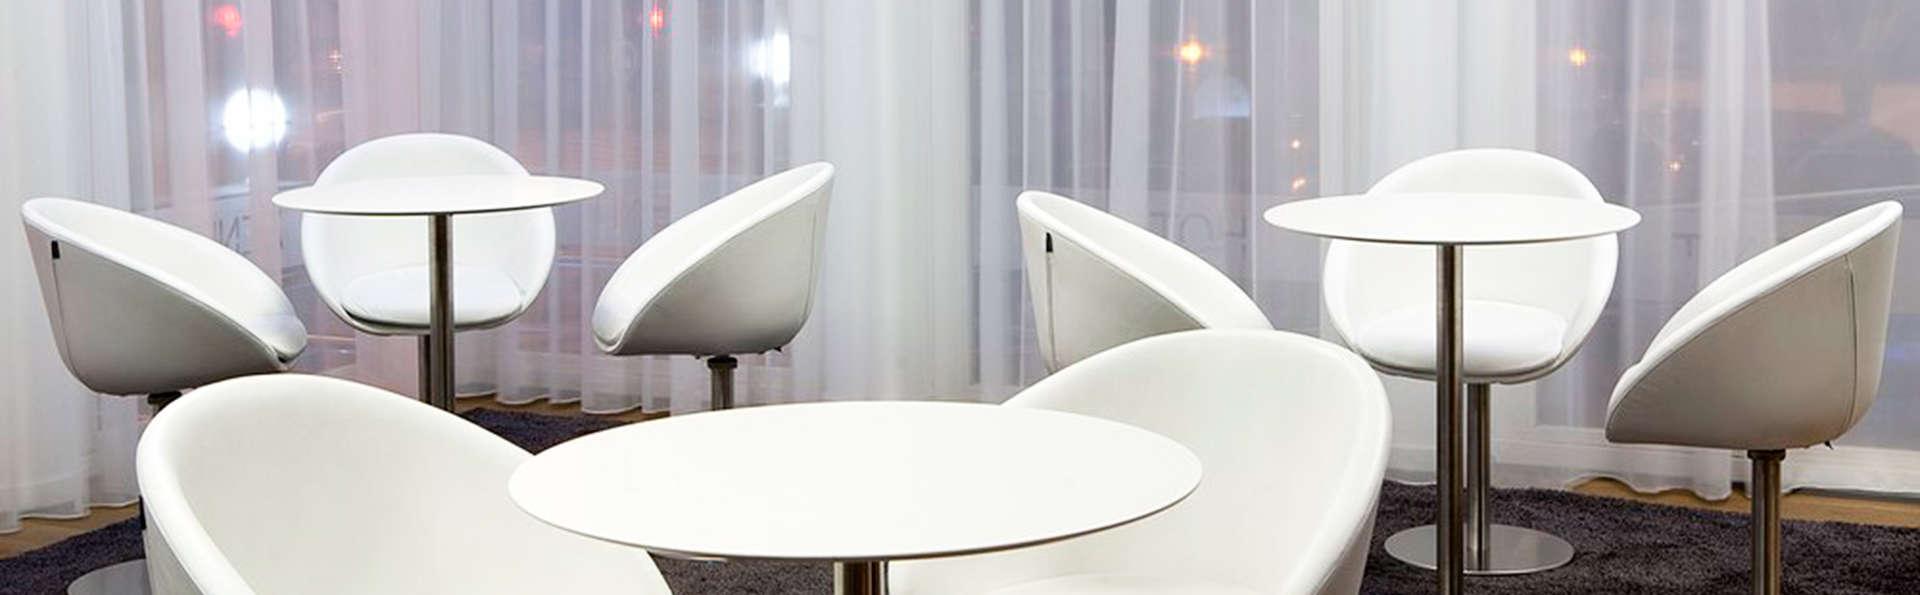 Hotel Zenit Conde de Orgaz - EDIT_lobby.jpg